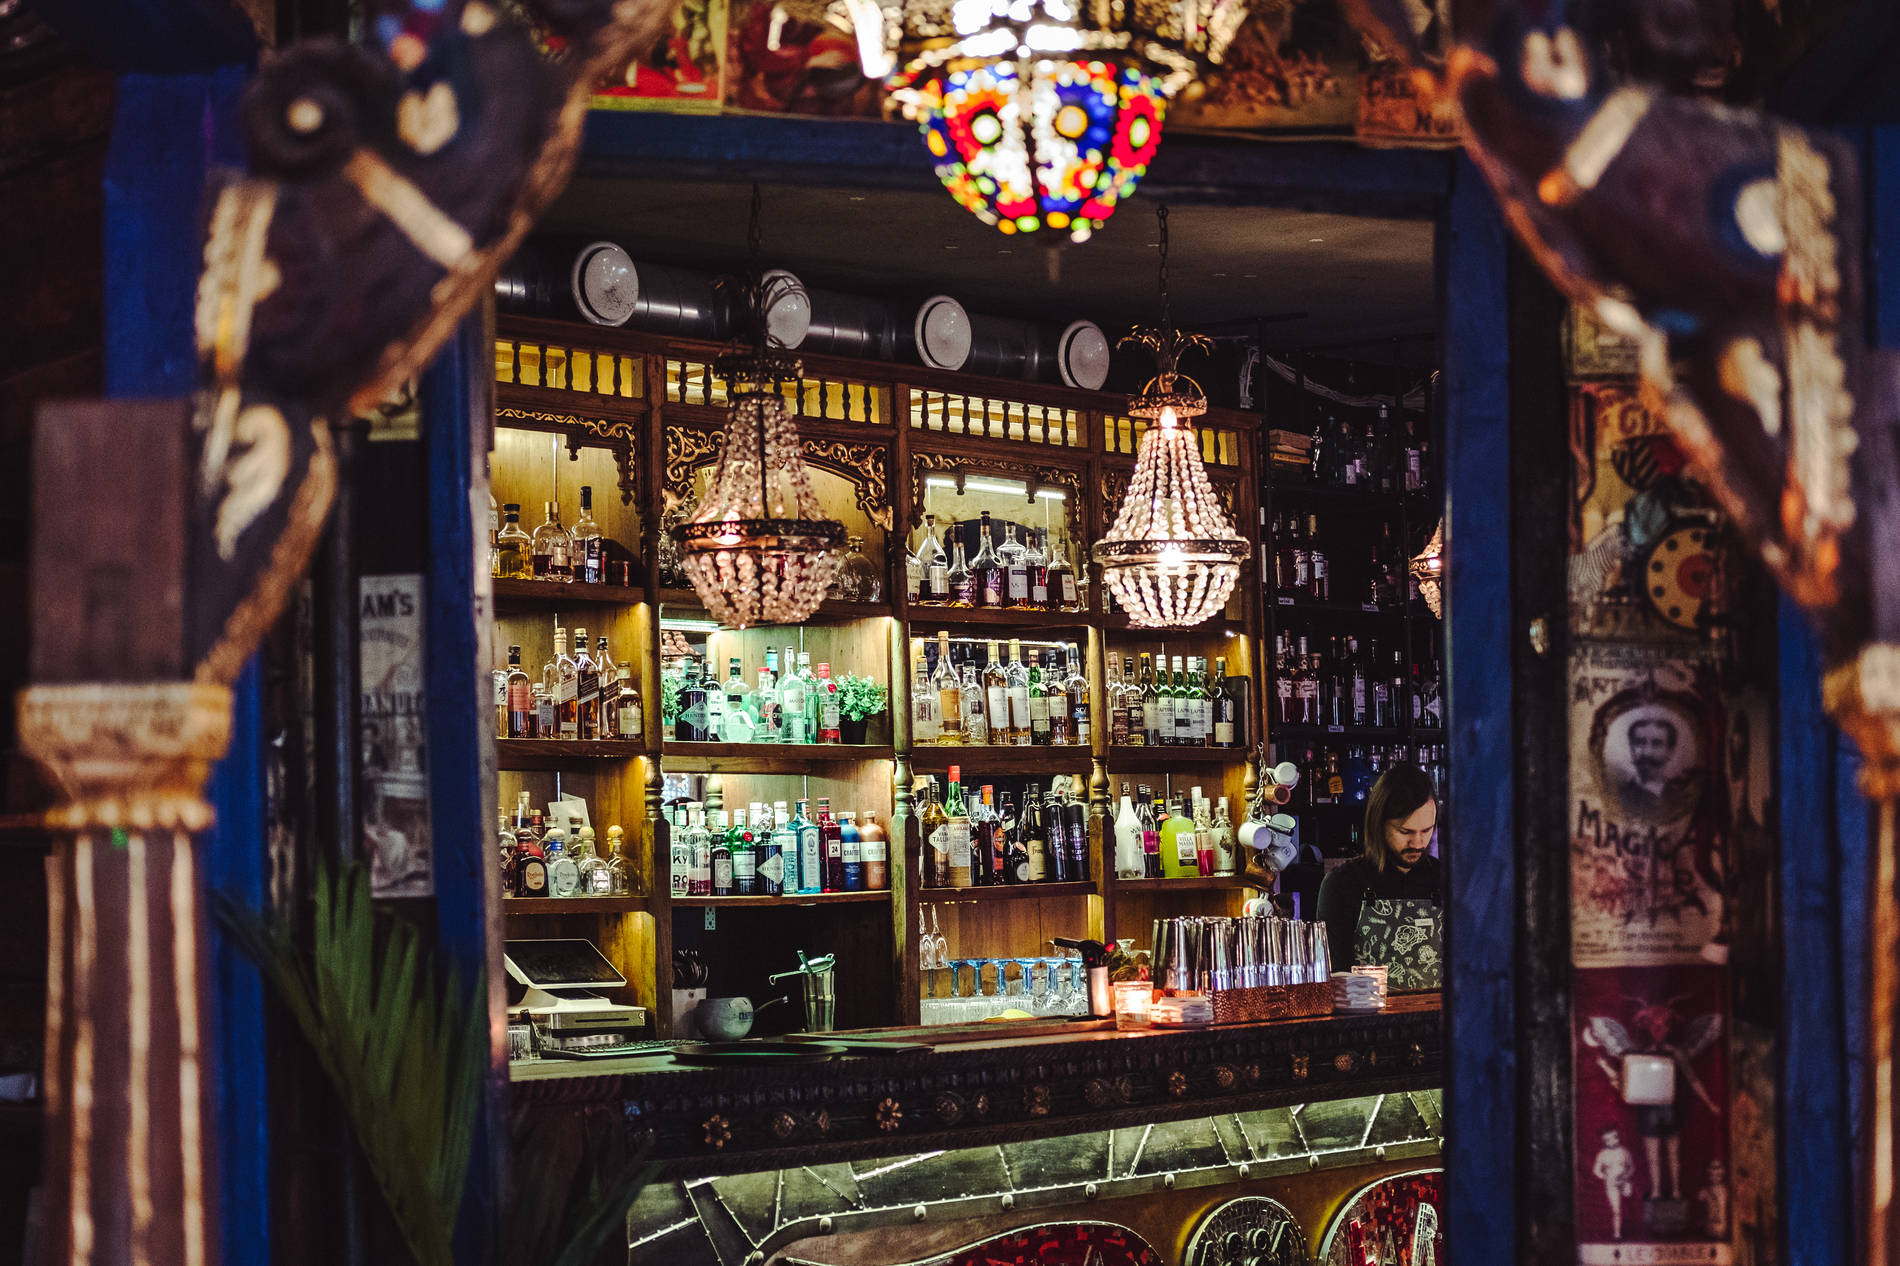 Interior of Manna la Roosa bar in Tallinn, Estonia